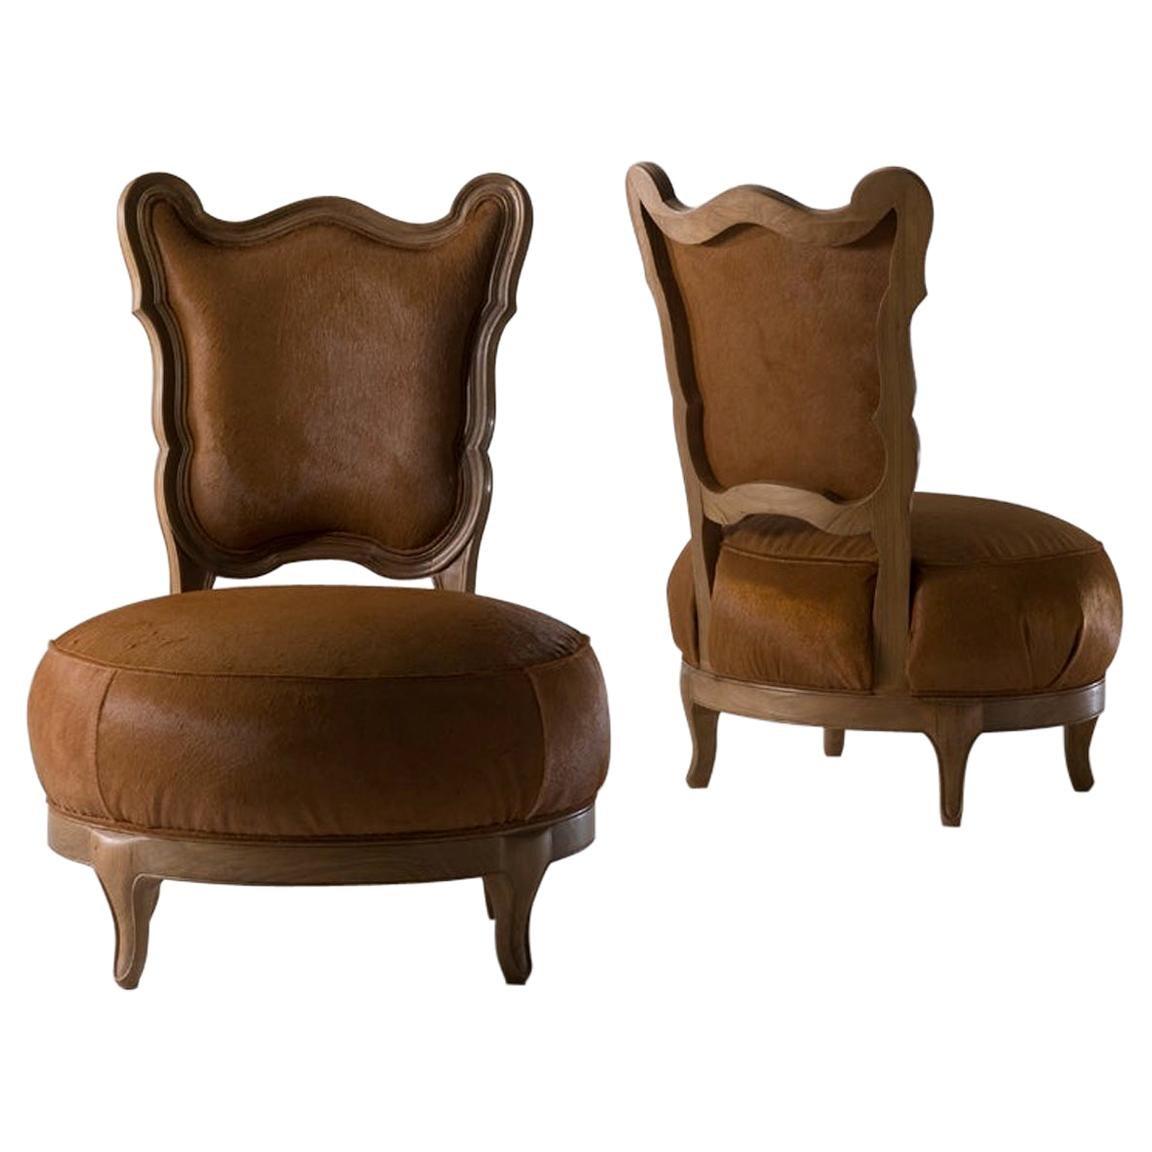 Gattona Solid walnut Dining Chair with Pony Leather